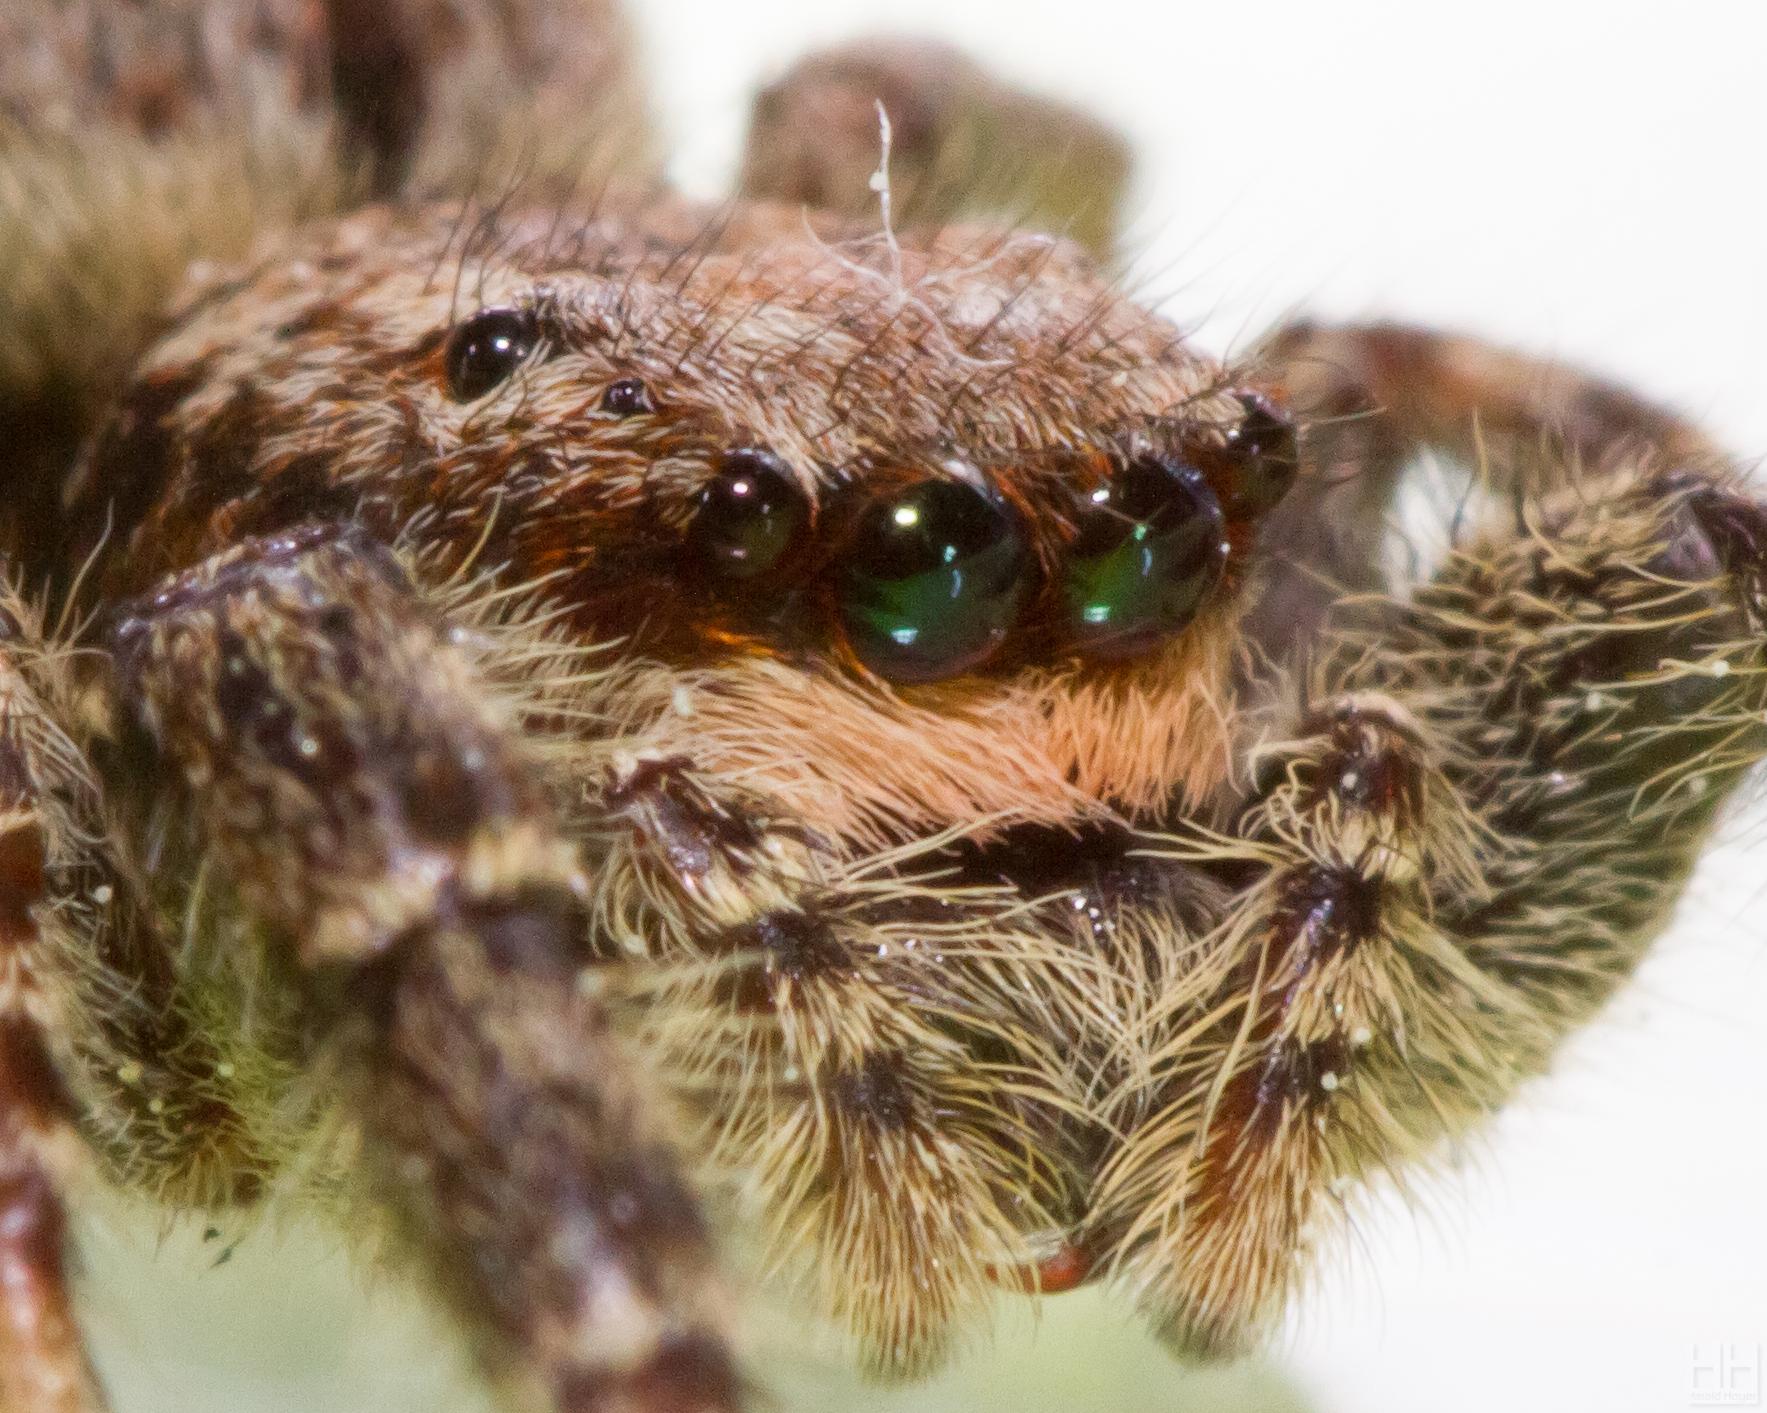 Biiig Jumping Spider - Head Crop